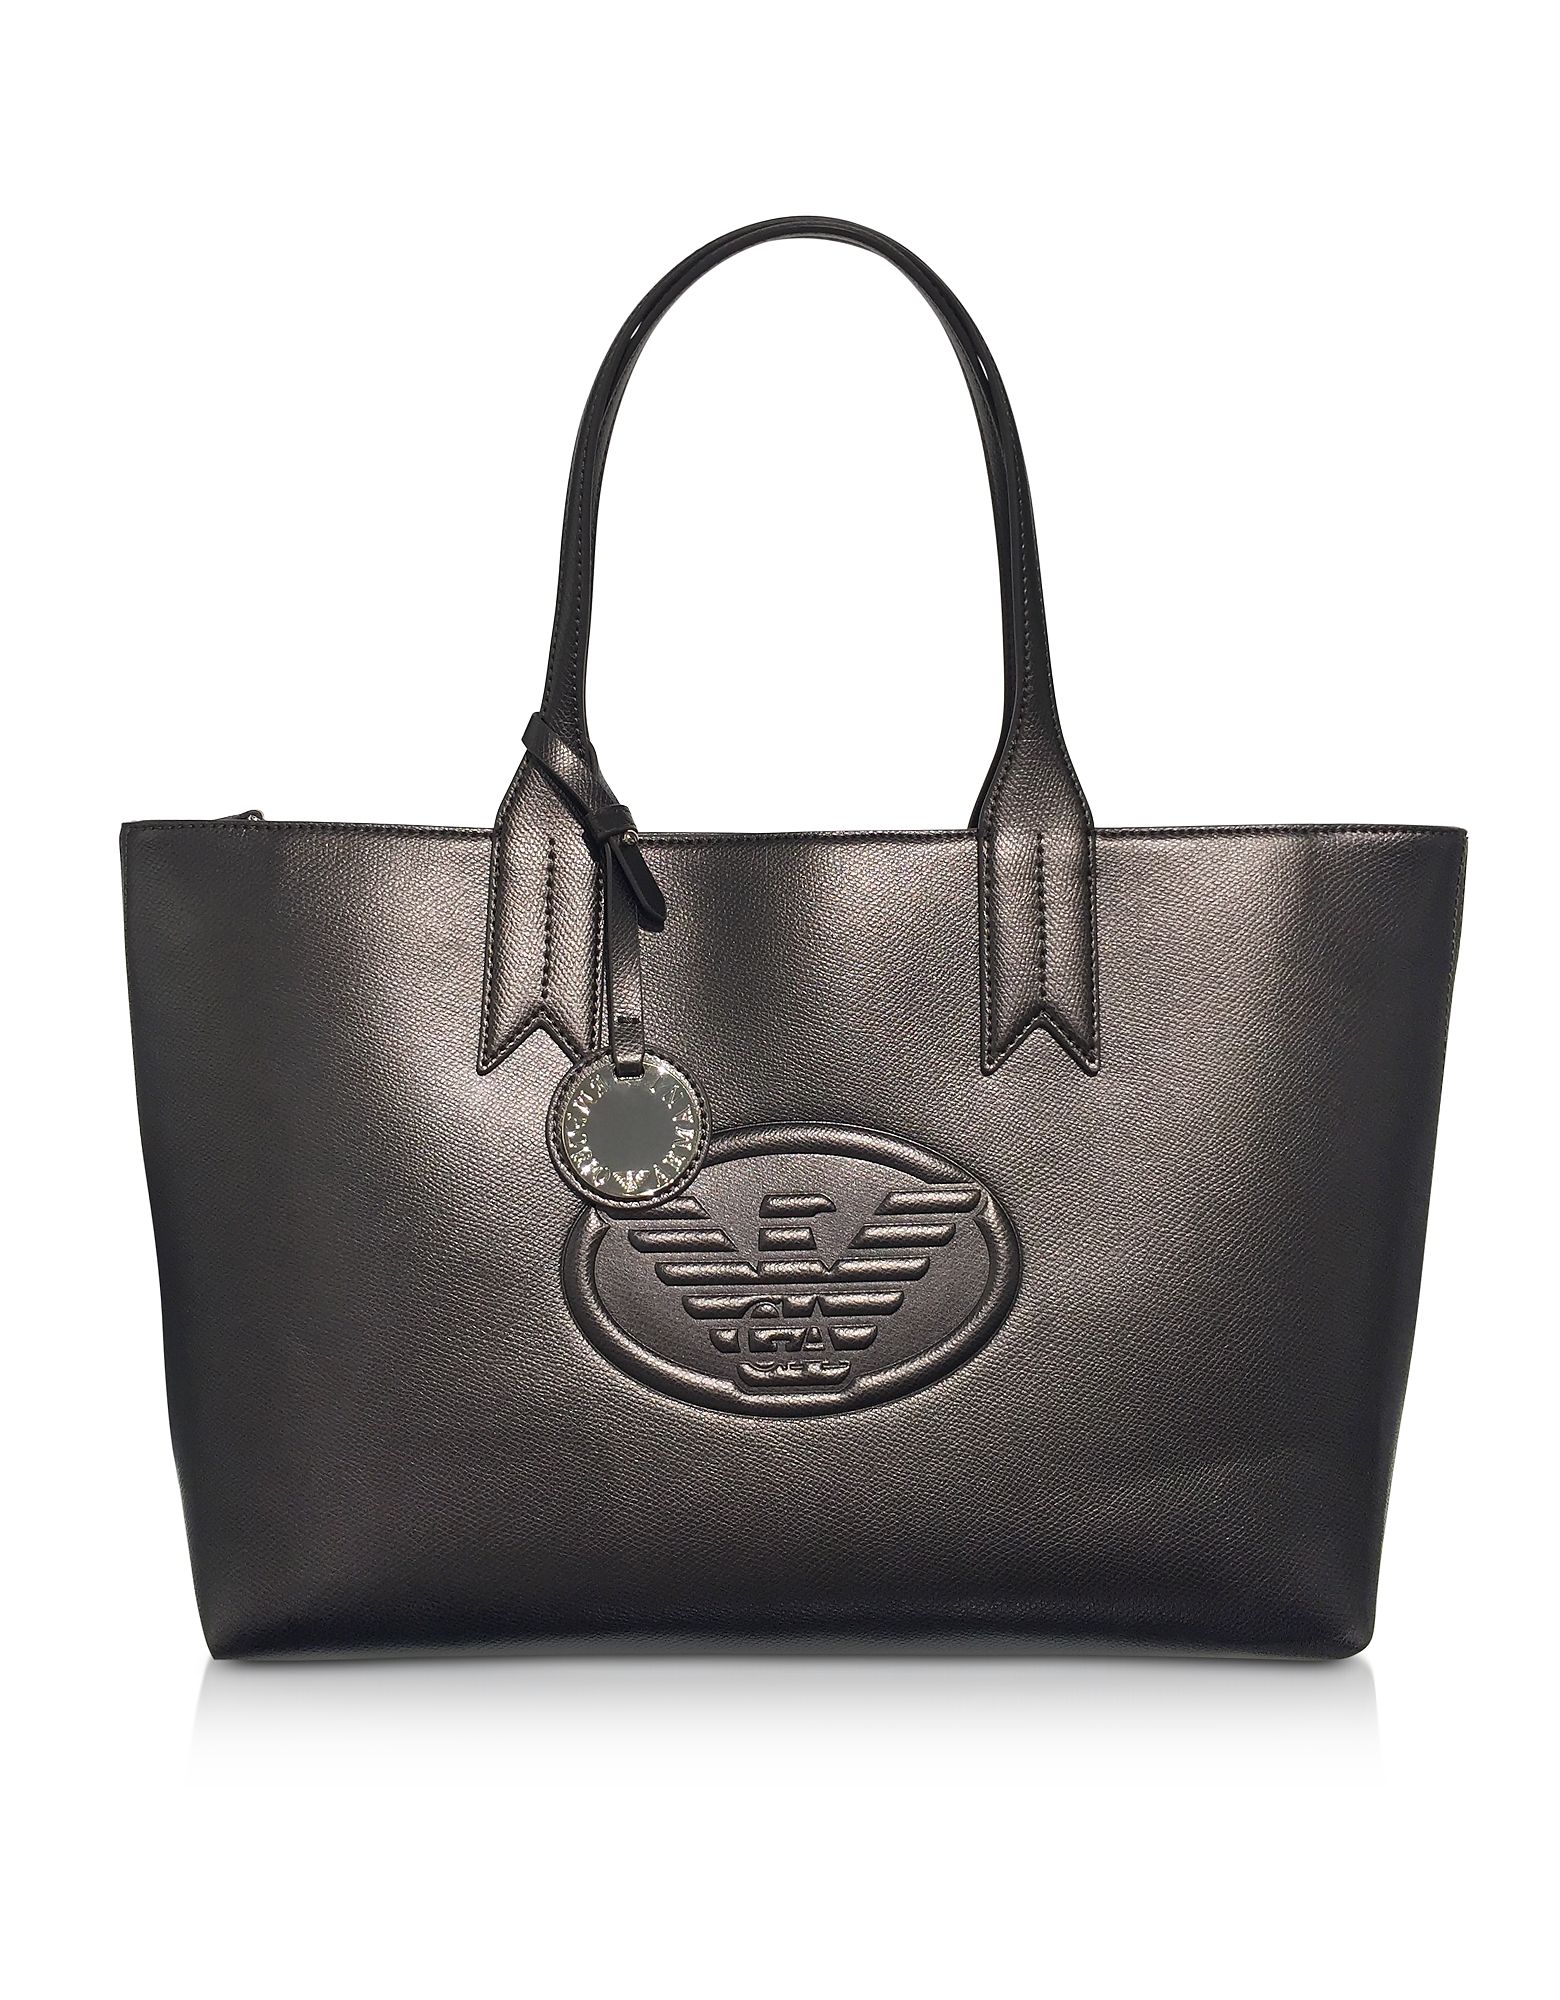 3a490c04abb0 Emporio Armani Dark Gray Steel Embossed Logo Large Tote Bag ...